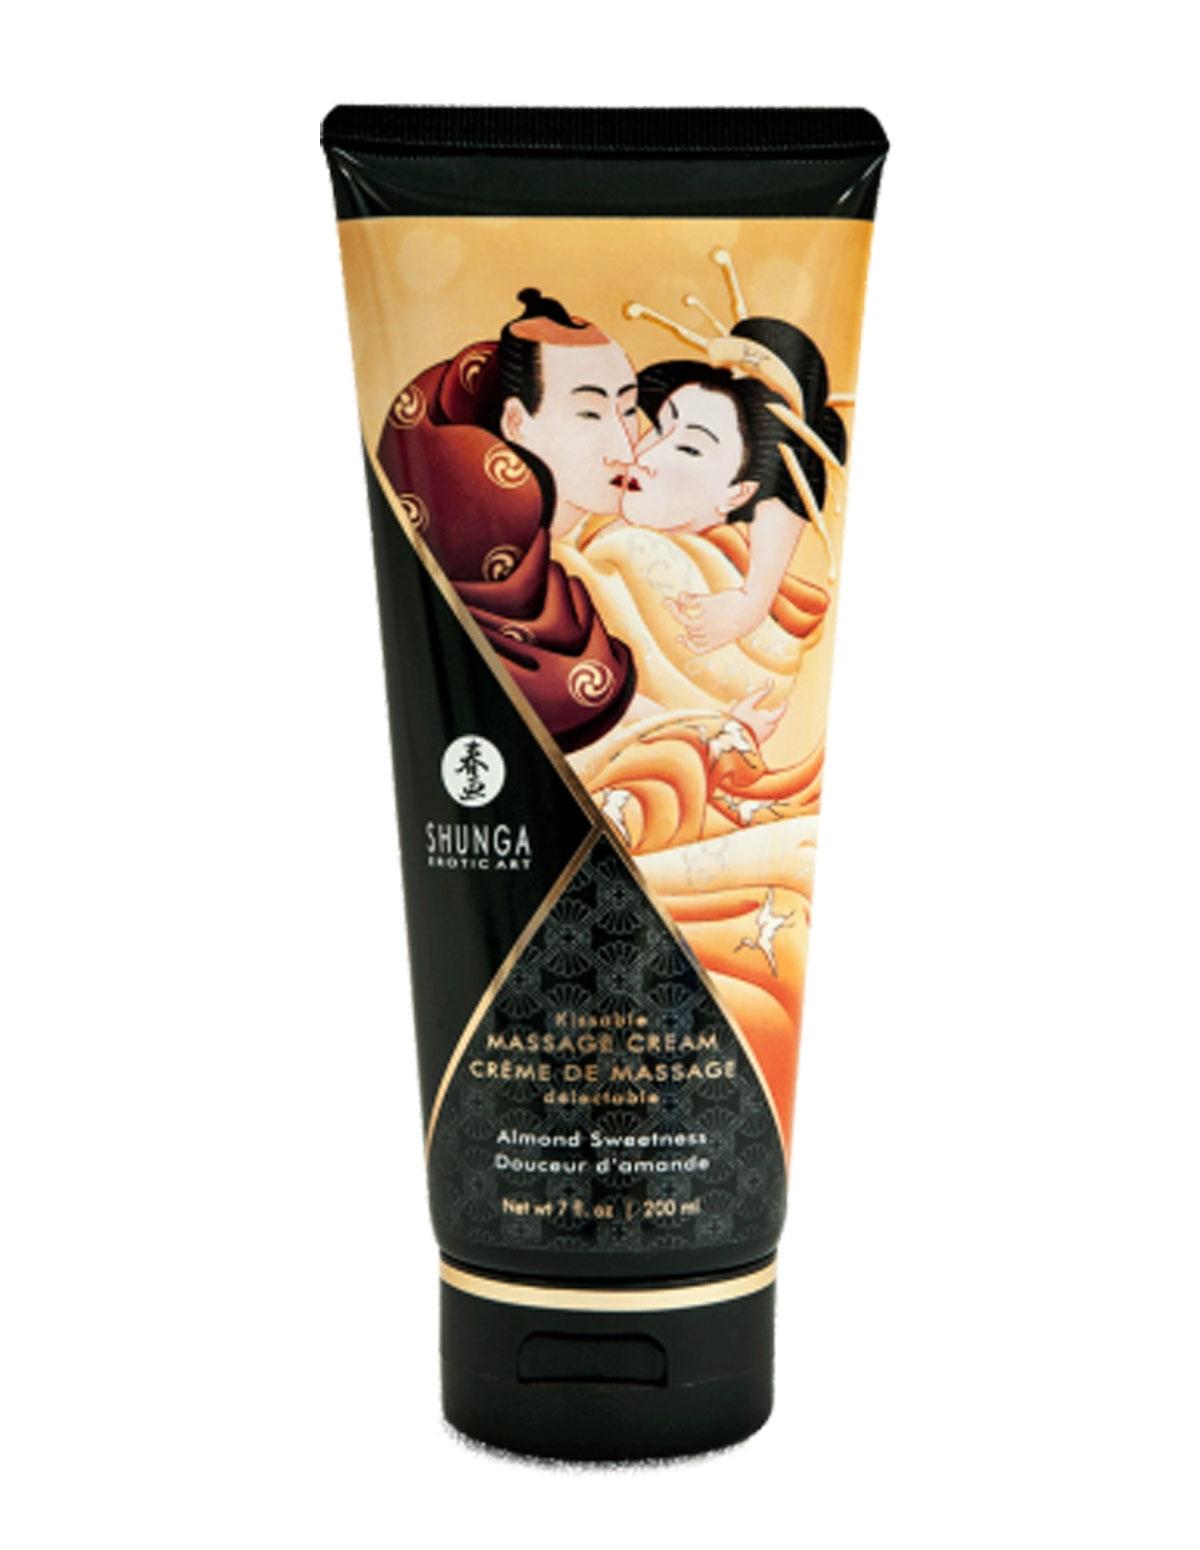 Kissable Massage Cream Almond Sweetness